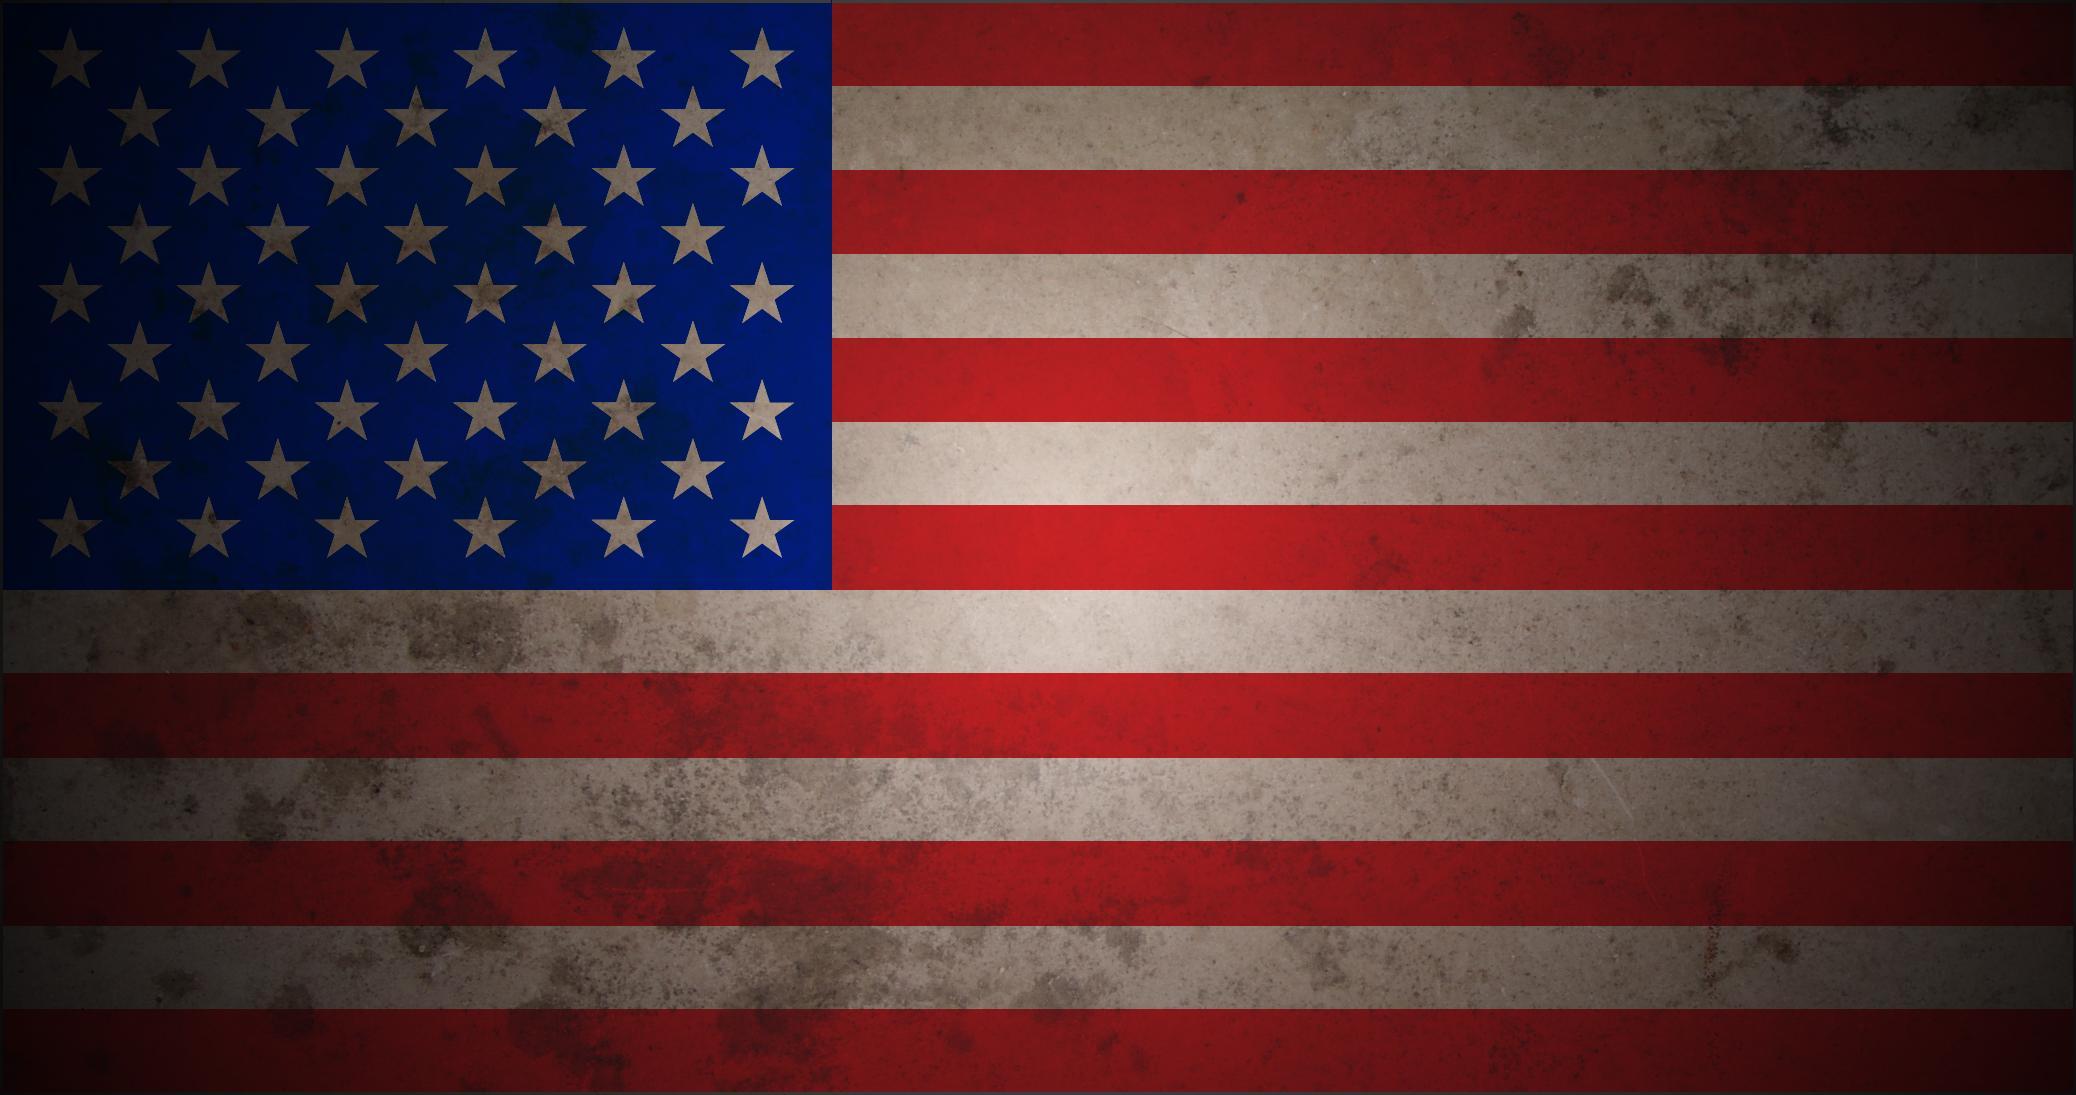 American background hd